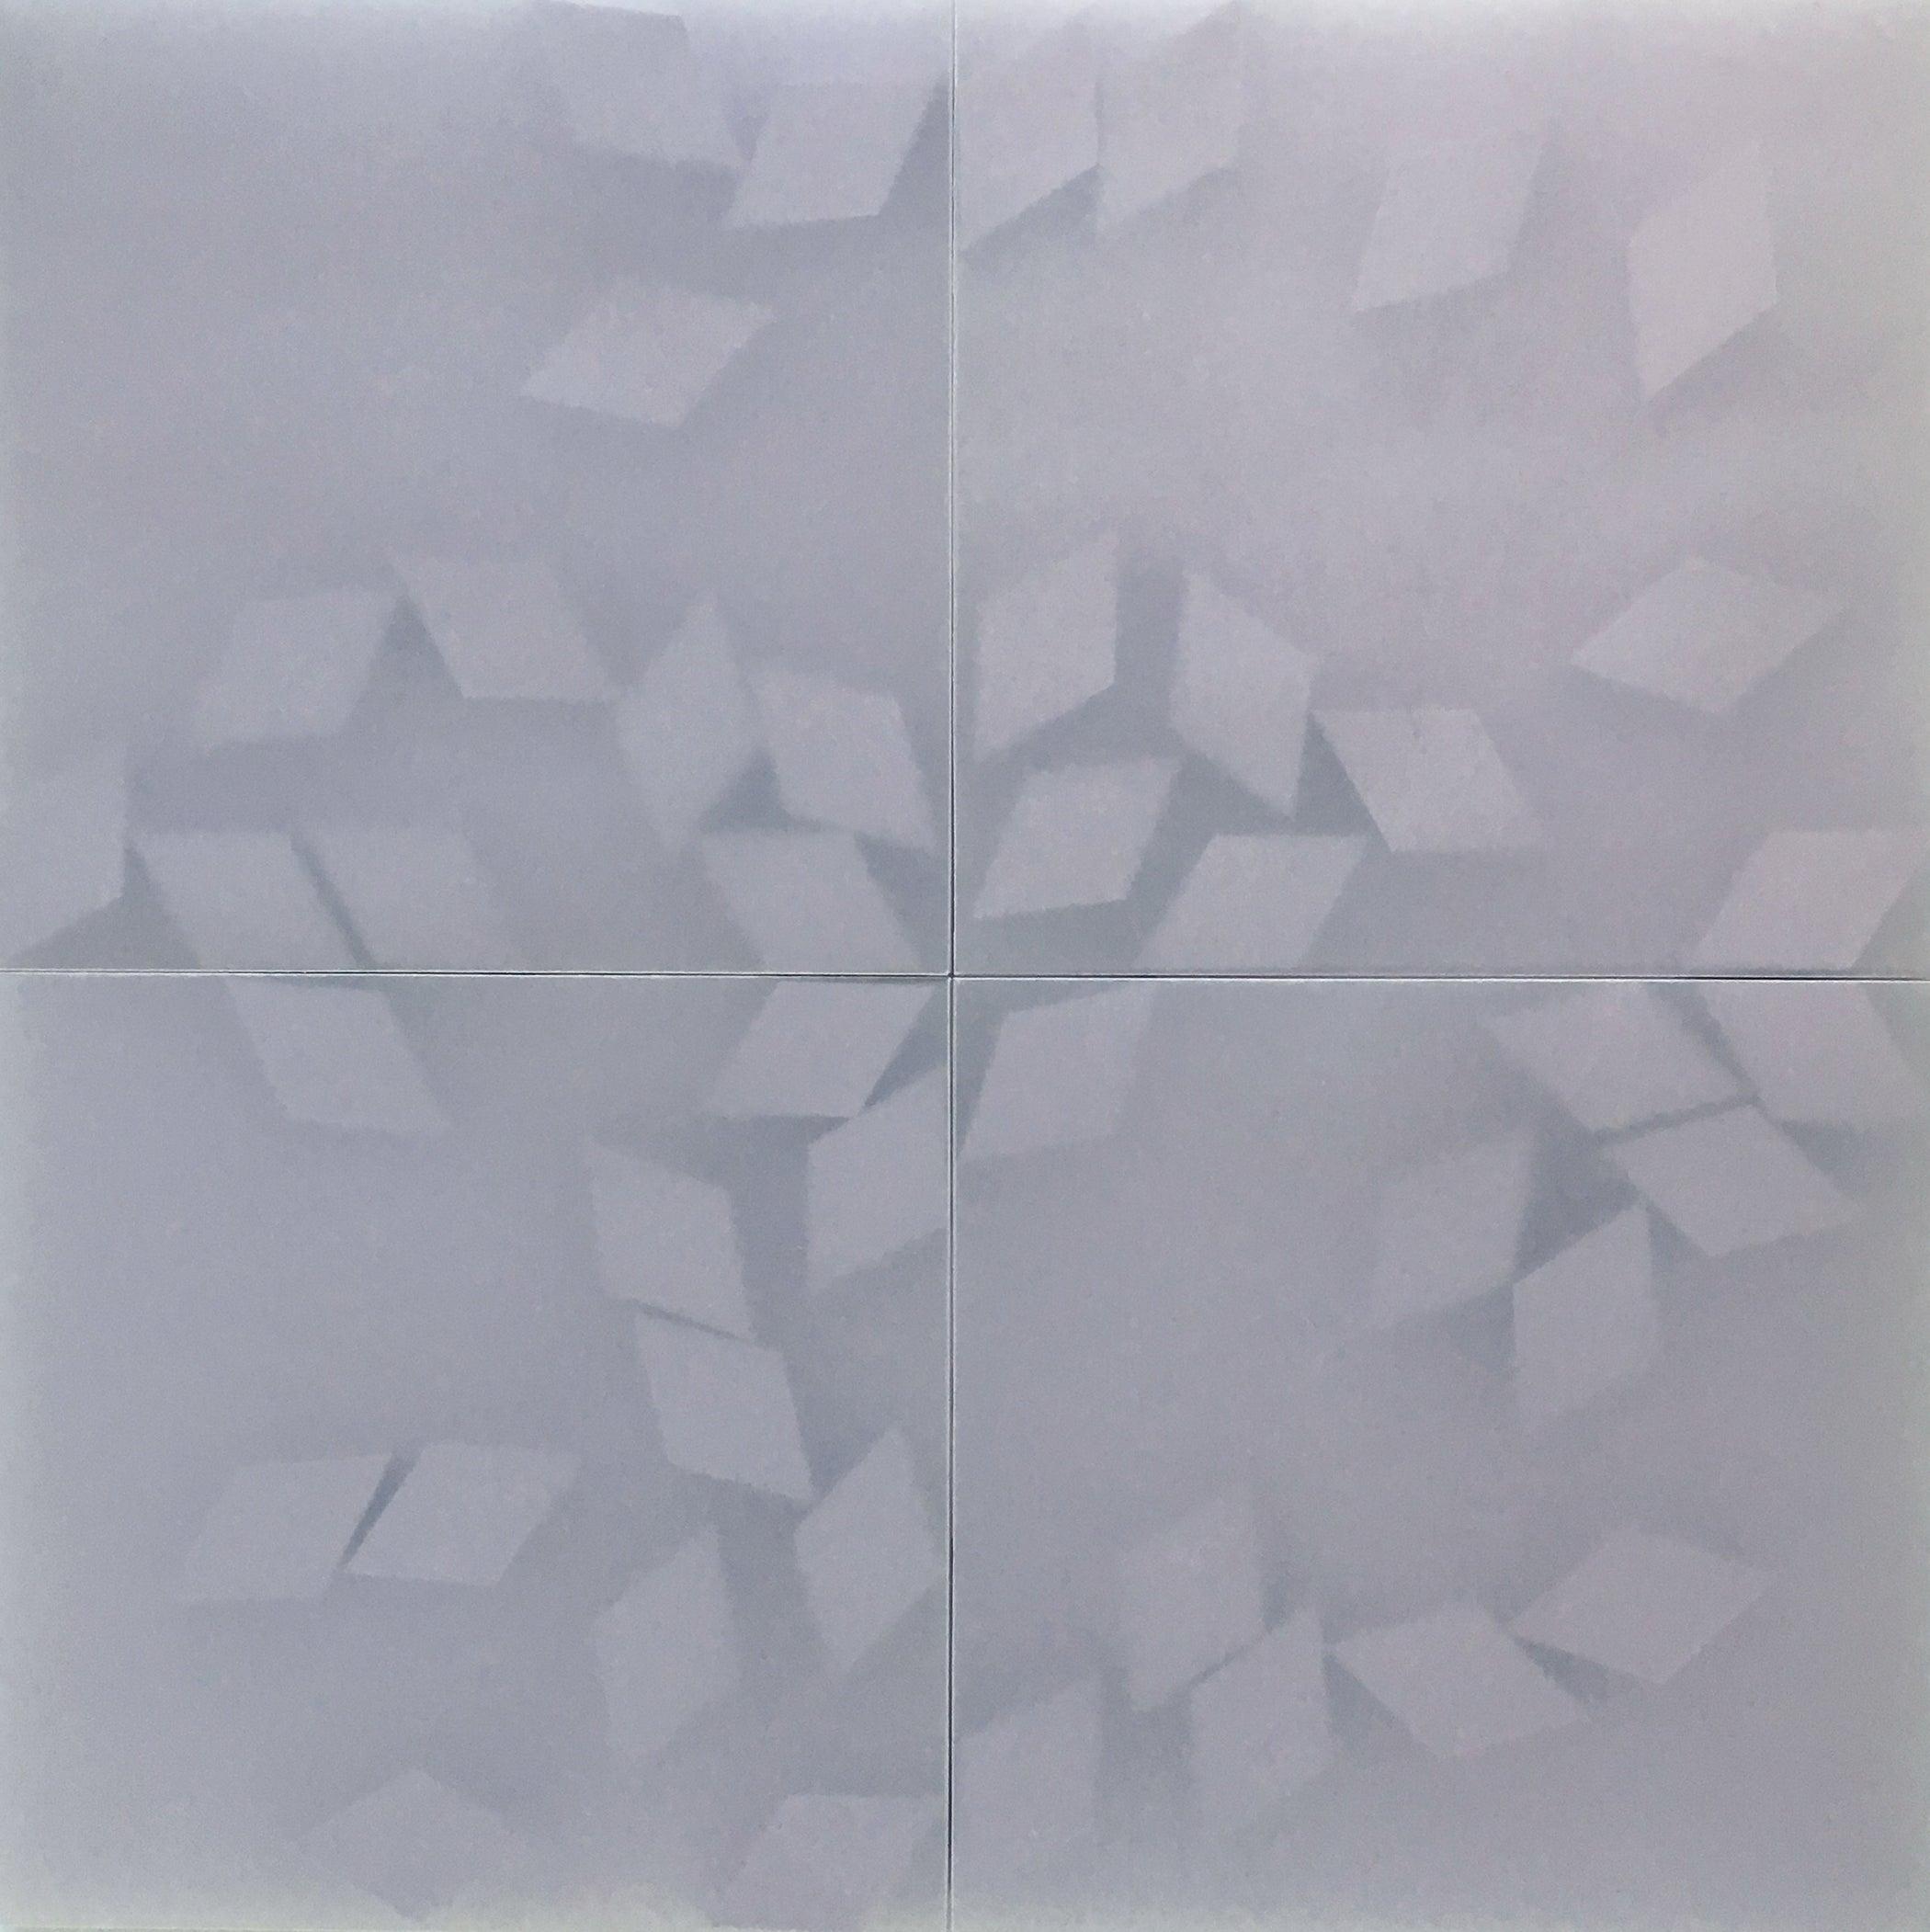 Norma Márquez Orozco, Purple Shapes, 2018, Translucent Paper, Minimalist, 31x31